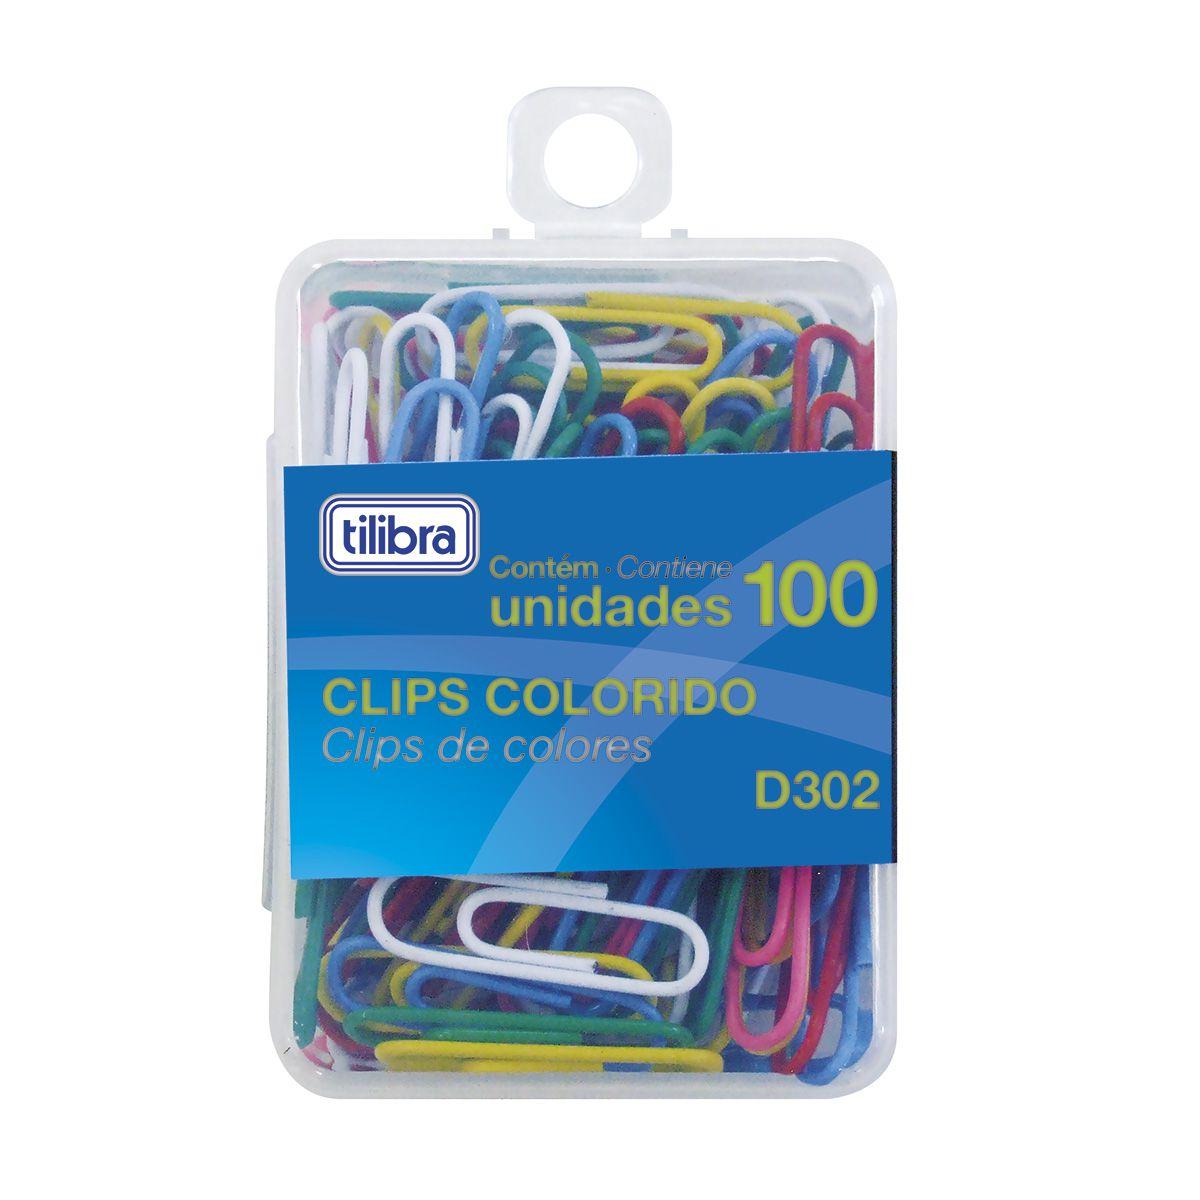 Clips 29mm colorido 100 un D302 Tilibra